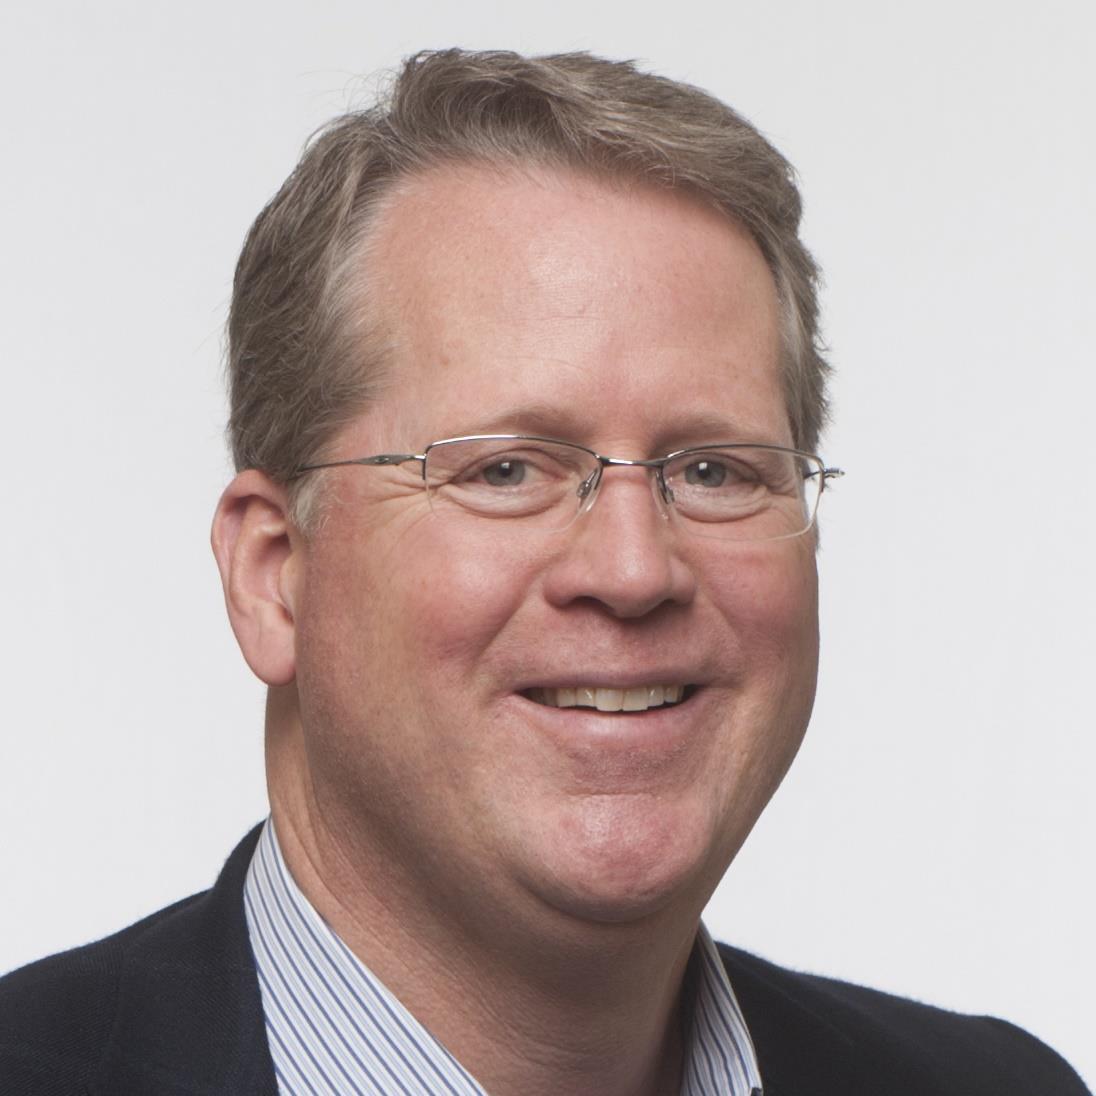 Paul Van Deventer Headshot.jpg